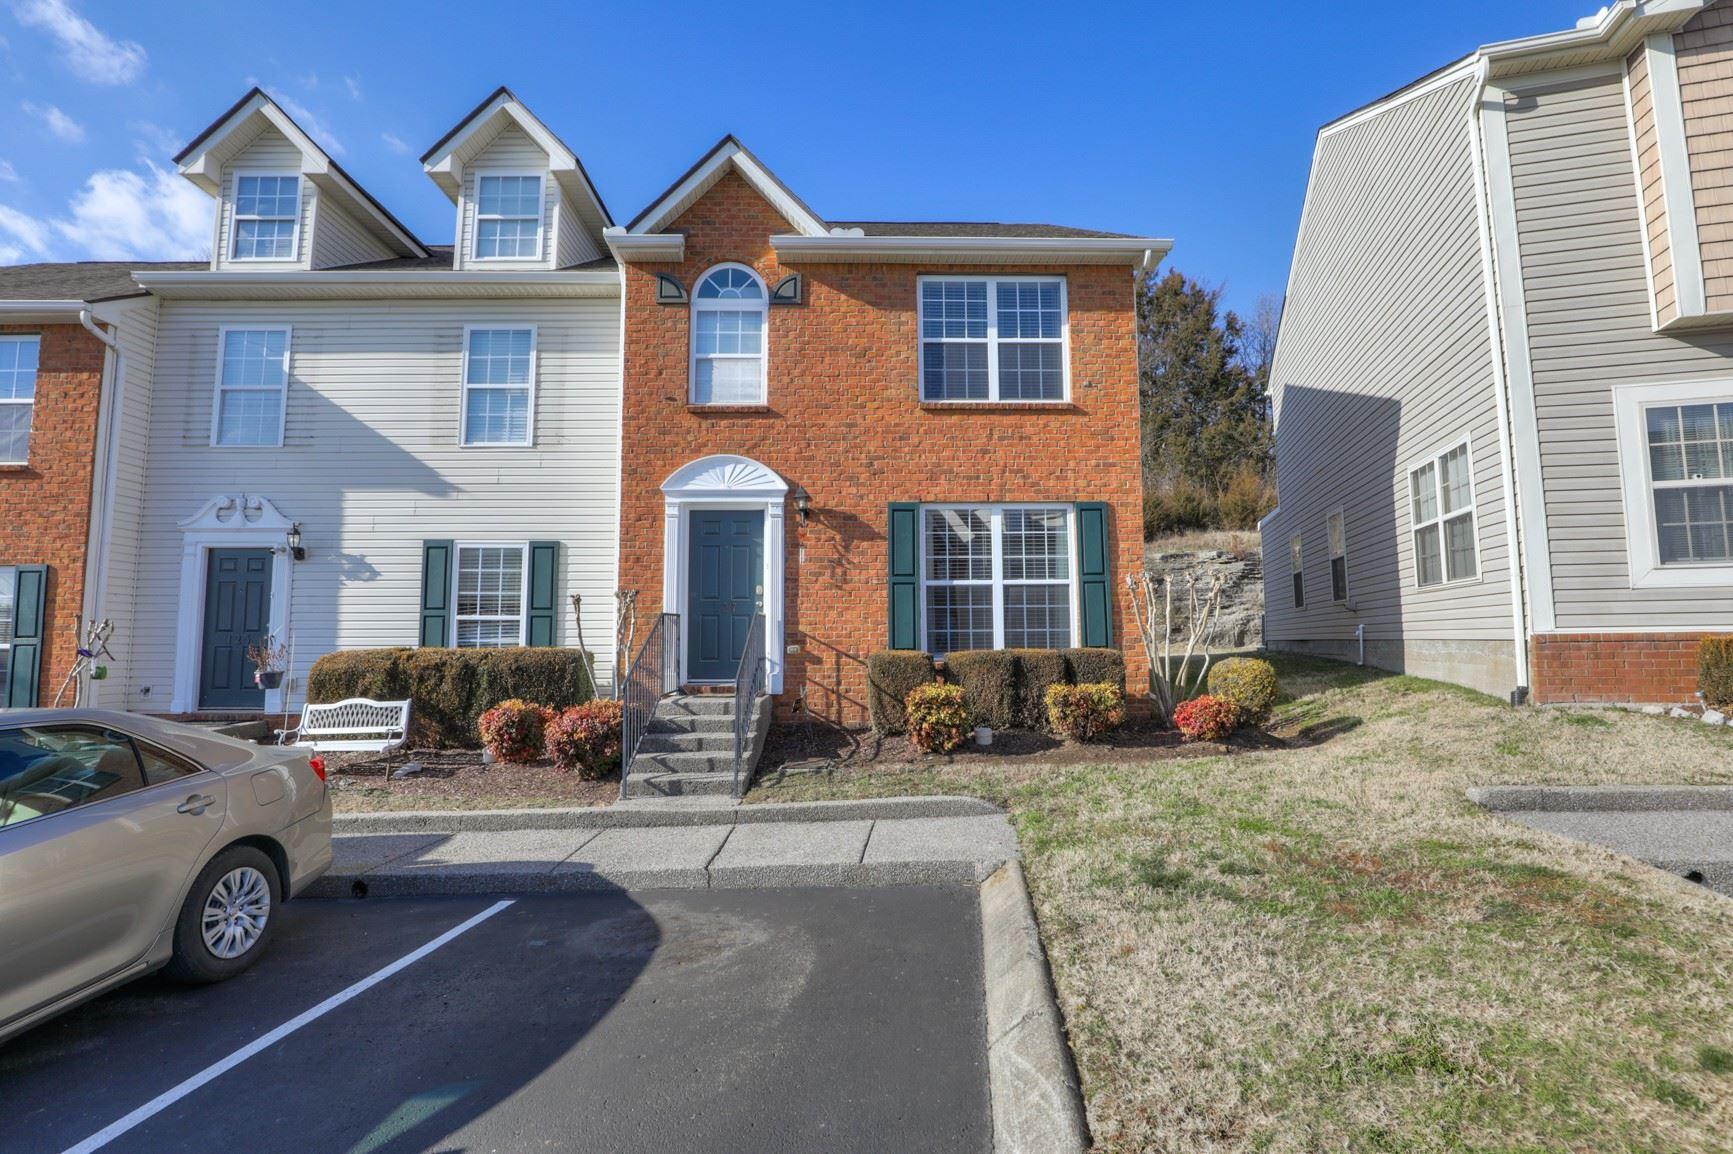 5170 Hickory Hollow Pkwy #127, Antioch, TN 37013 - MLS#: 2225753